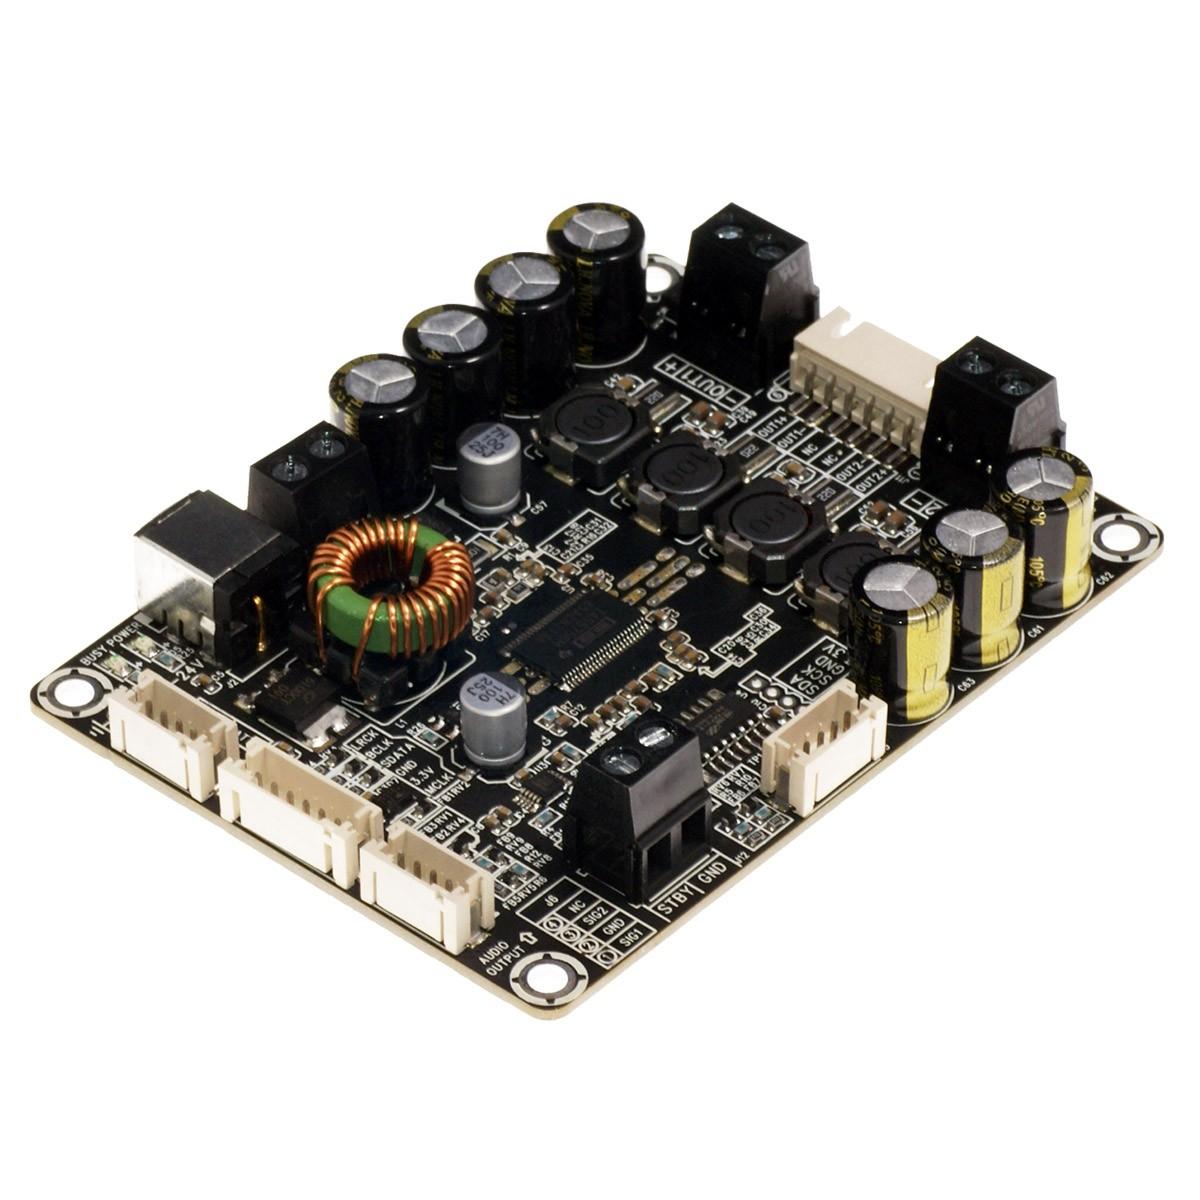 WONDOM AA-AB32255 Class D Amplifier DAC Module TAS5756 24bit 192kHz 2x30W 4 Ohm